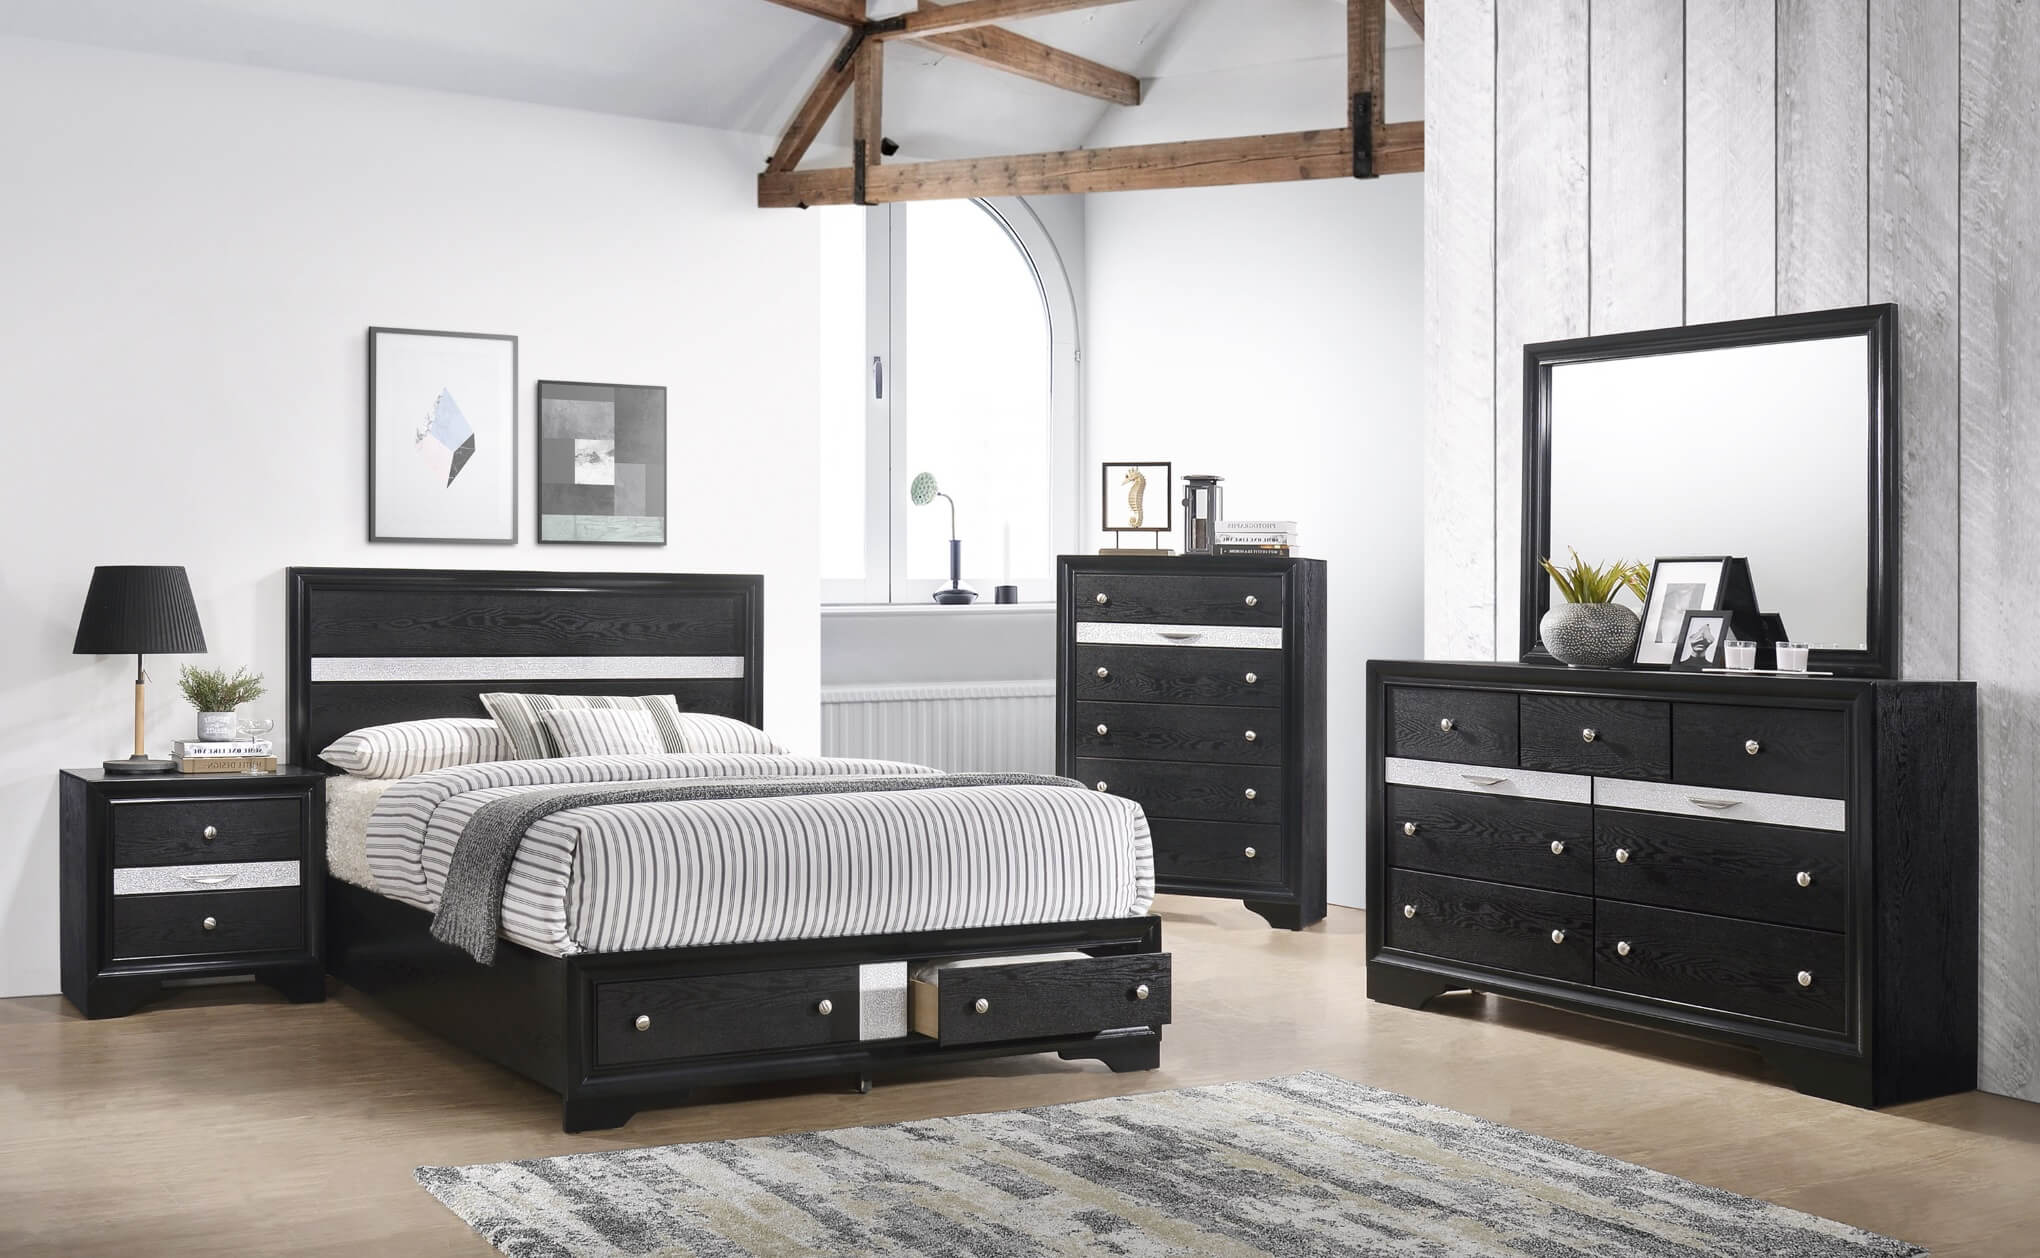 b4670 regata black storage bedroom set